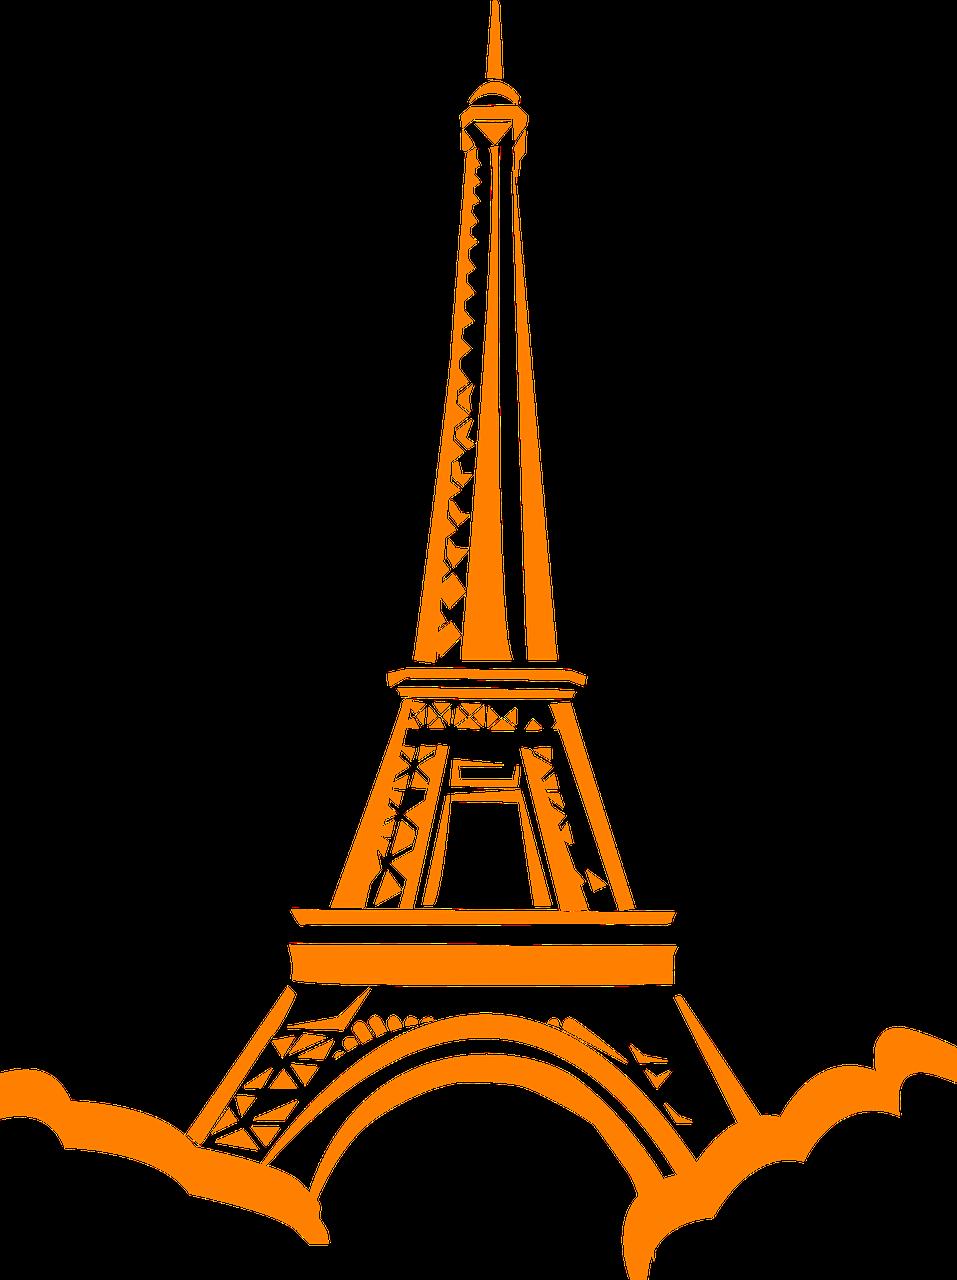 France eiffel tower landmark. French clipart themed paris